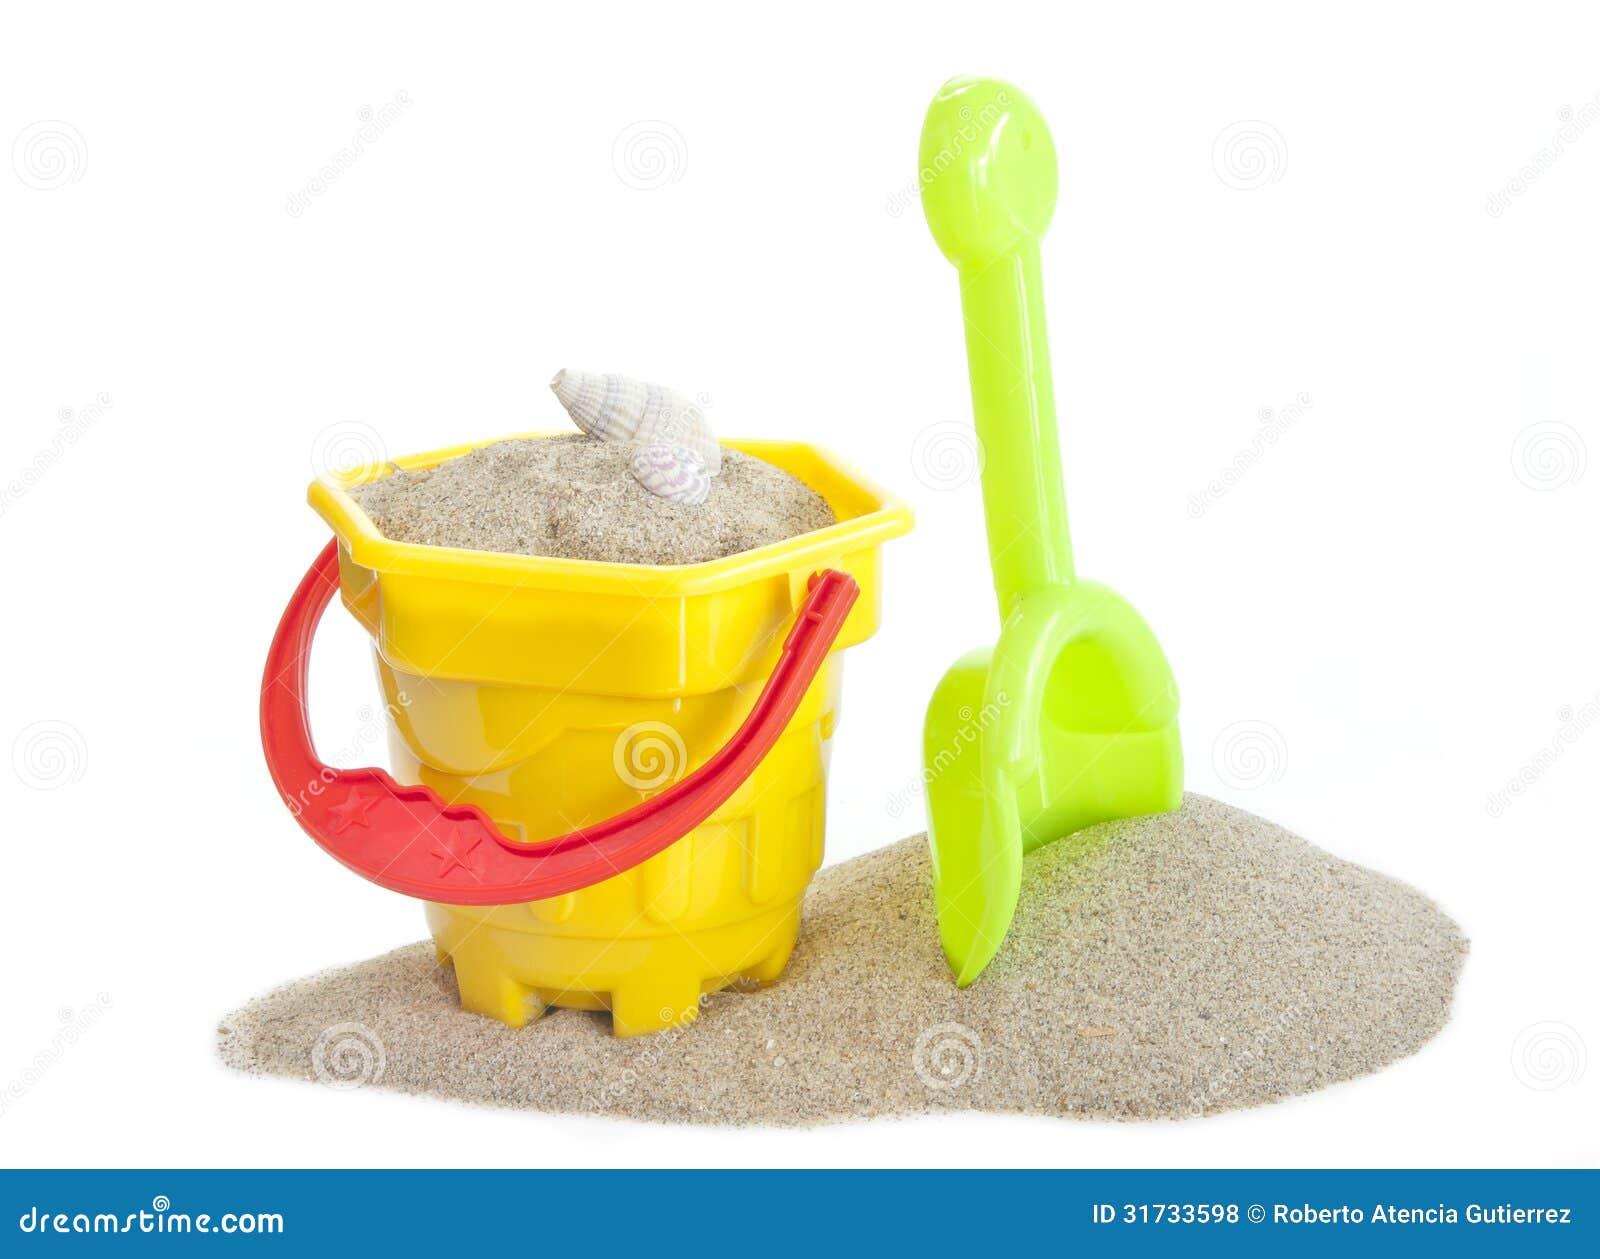 The Sandcastles - Volatile